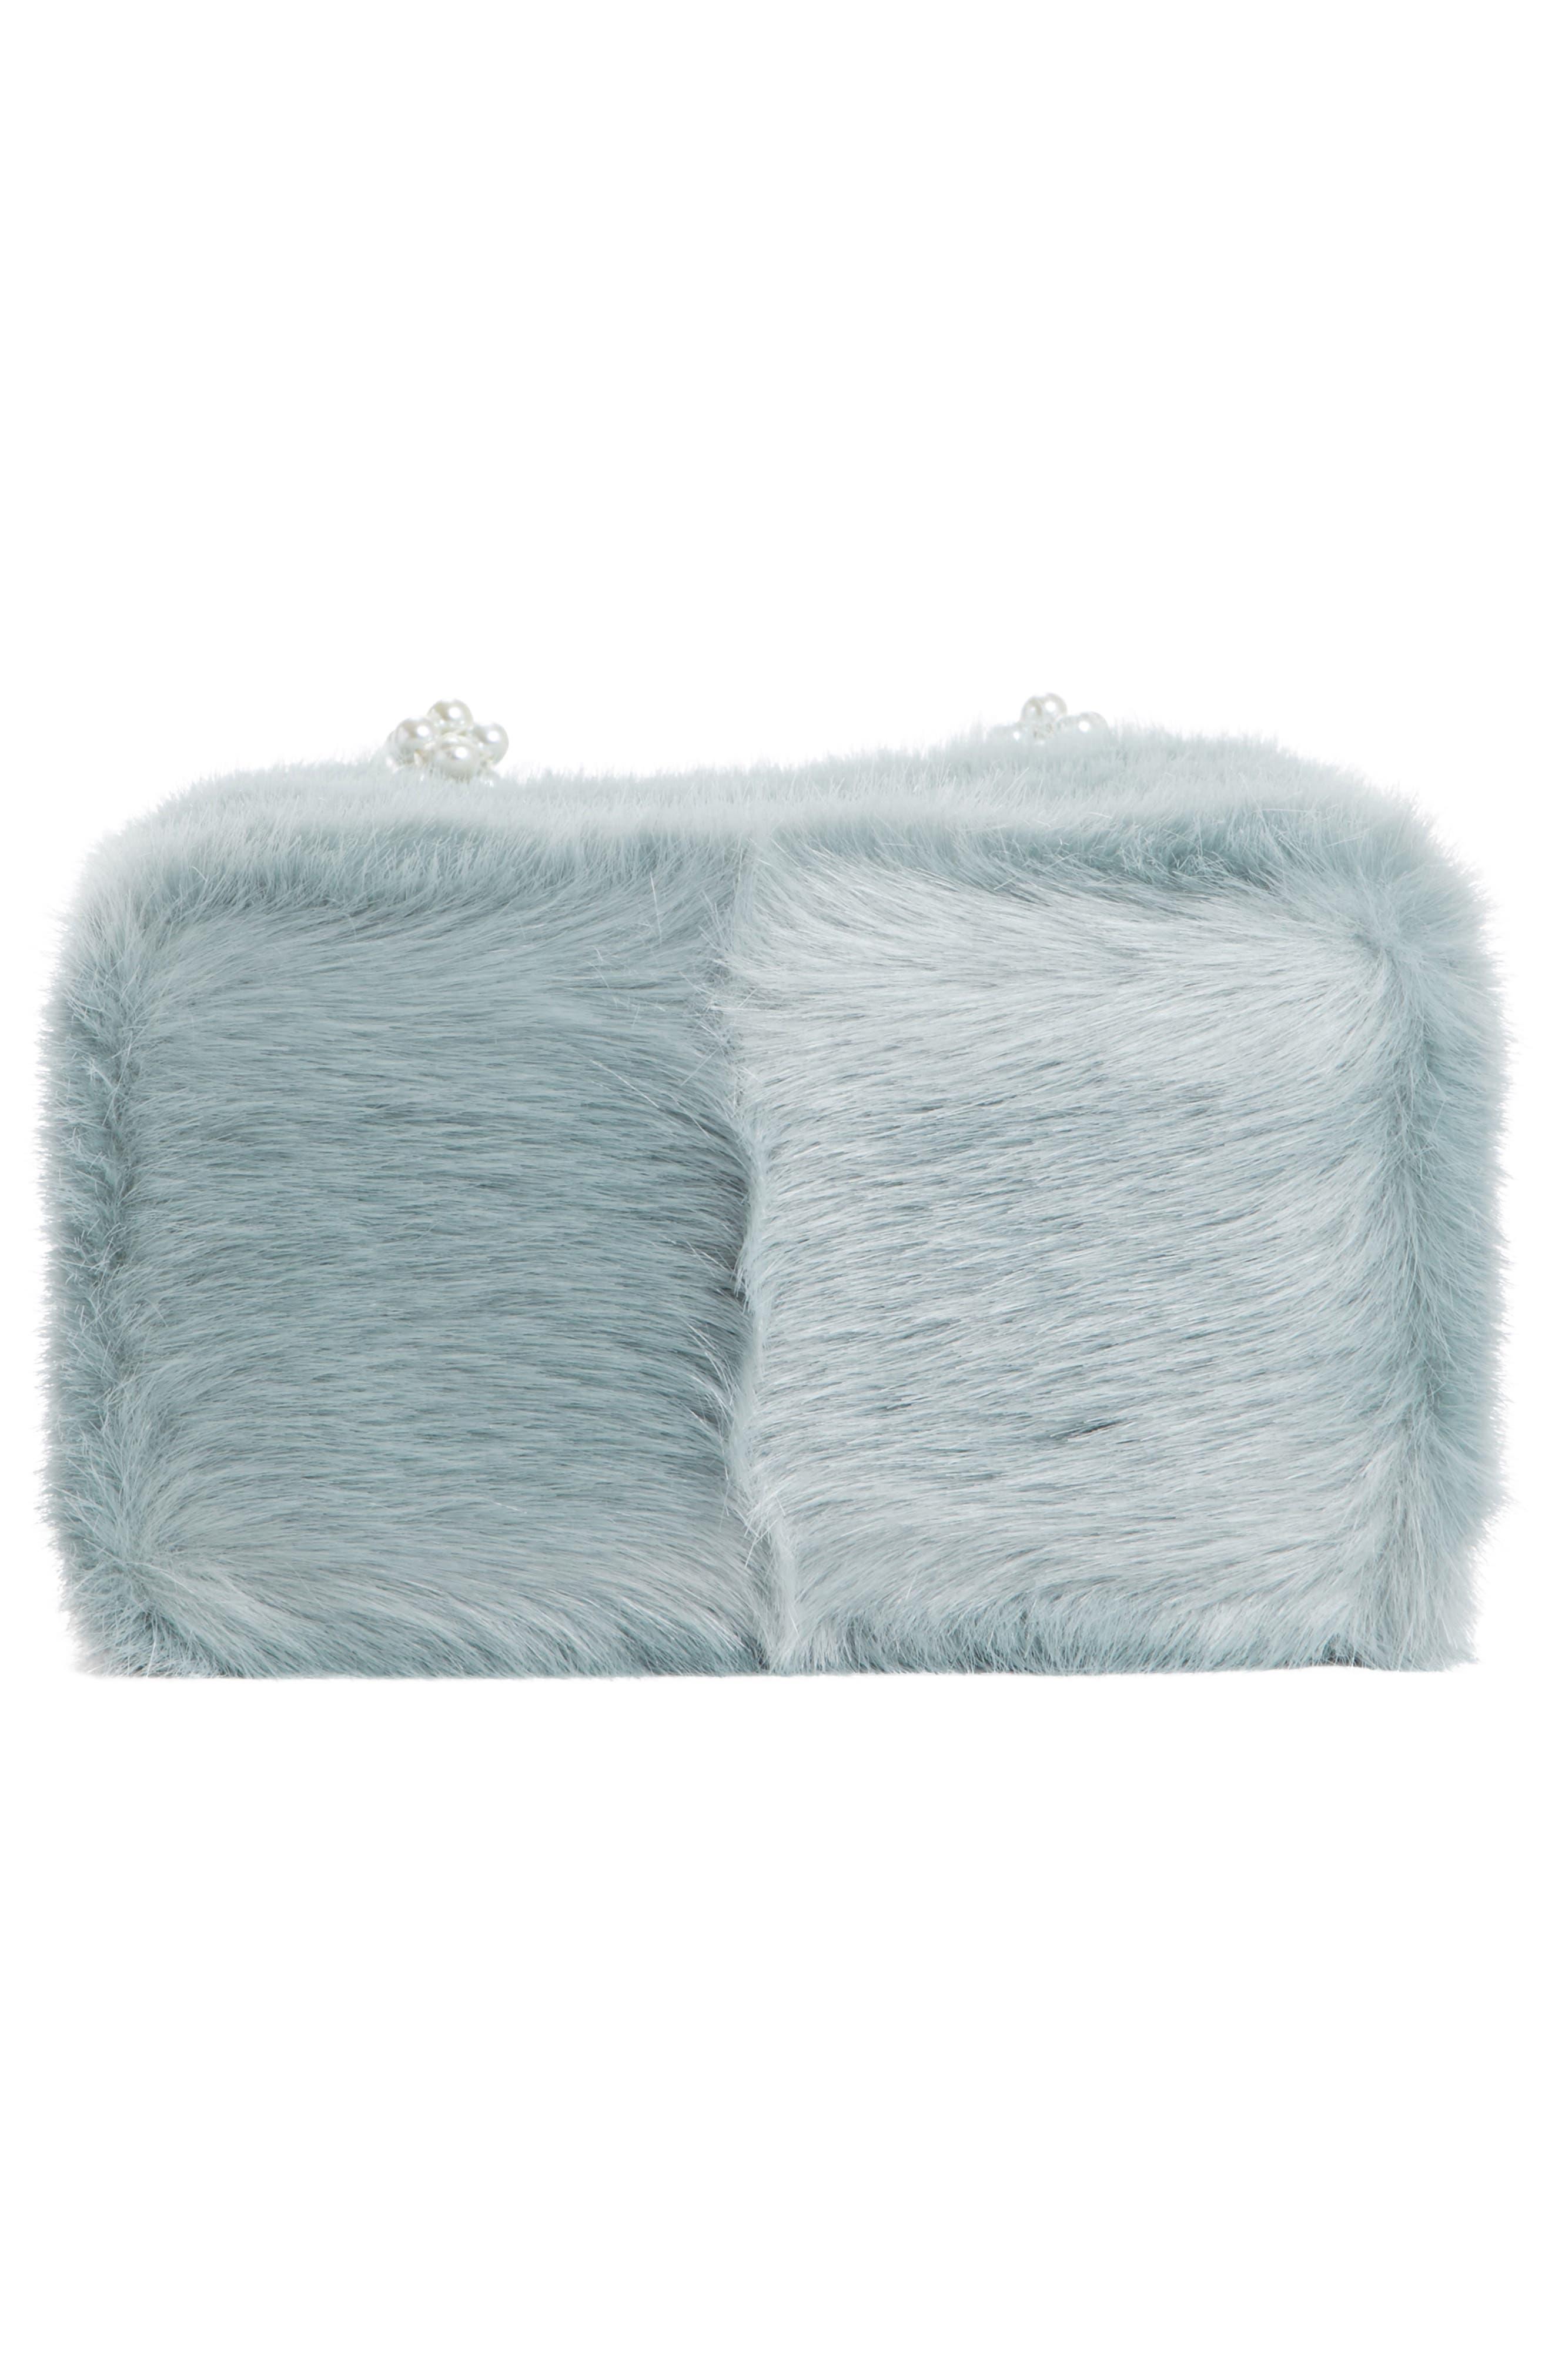 Una Check Faux Fur Bag with Imitation Pearl Handles,                             Alternate thumbnail 6, color,                             440